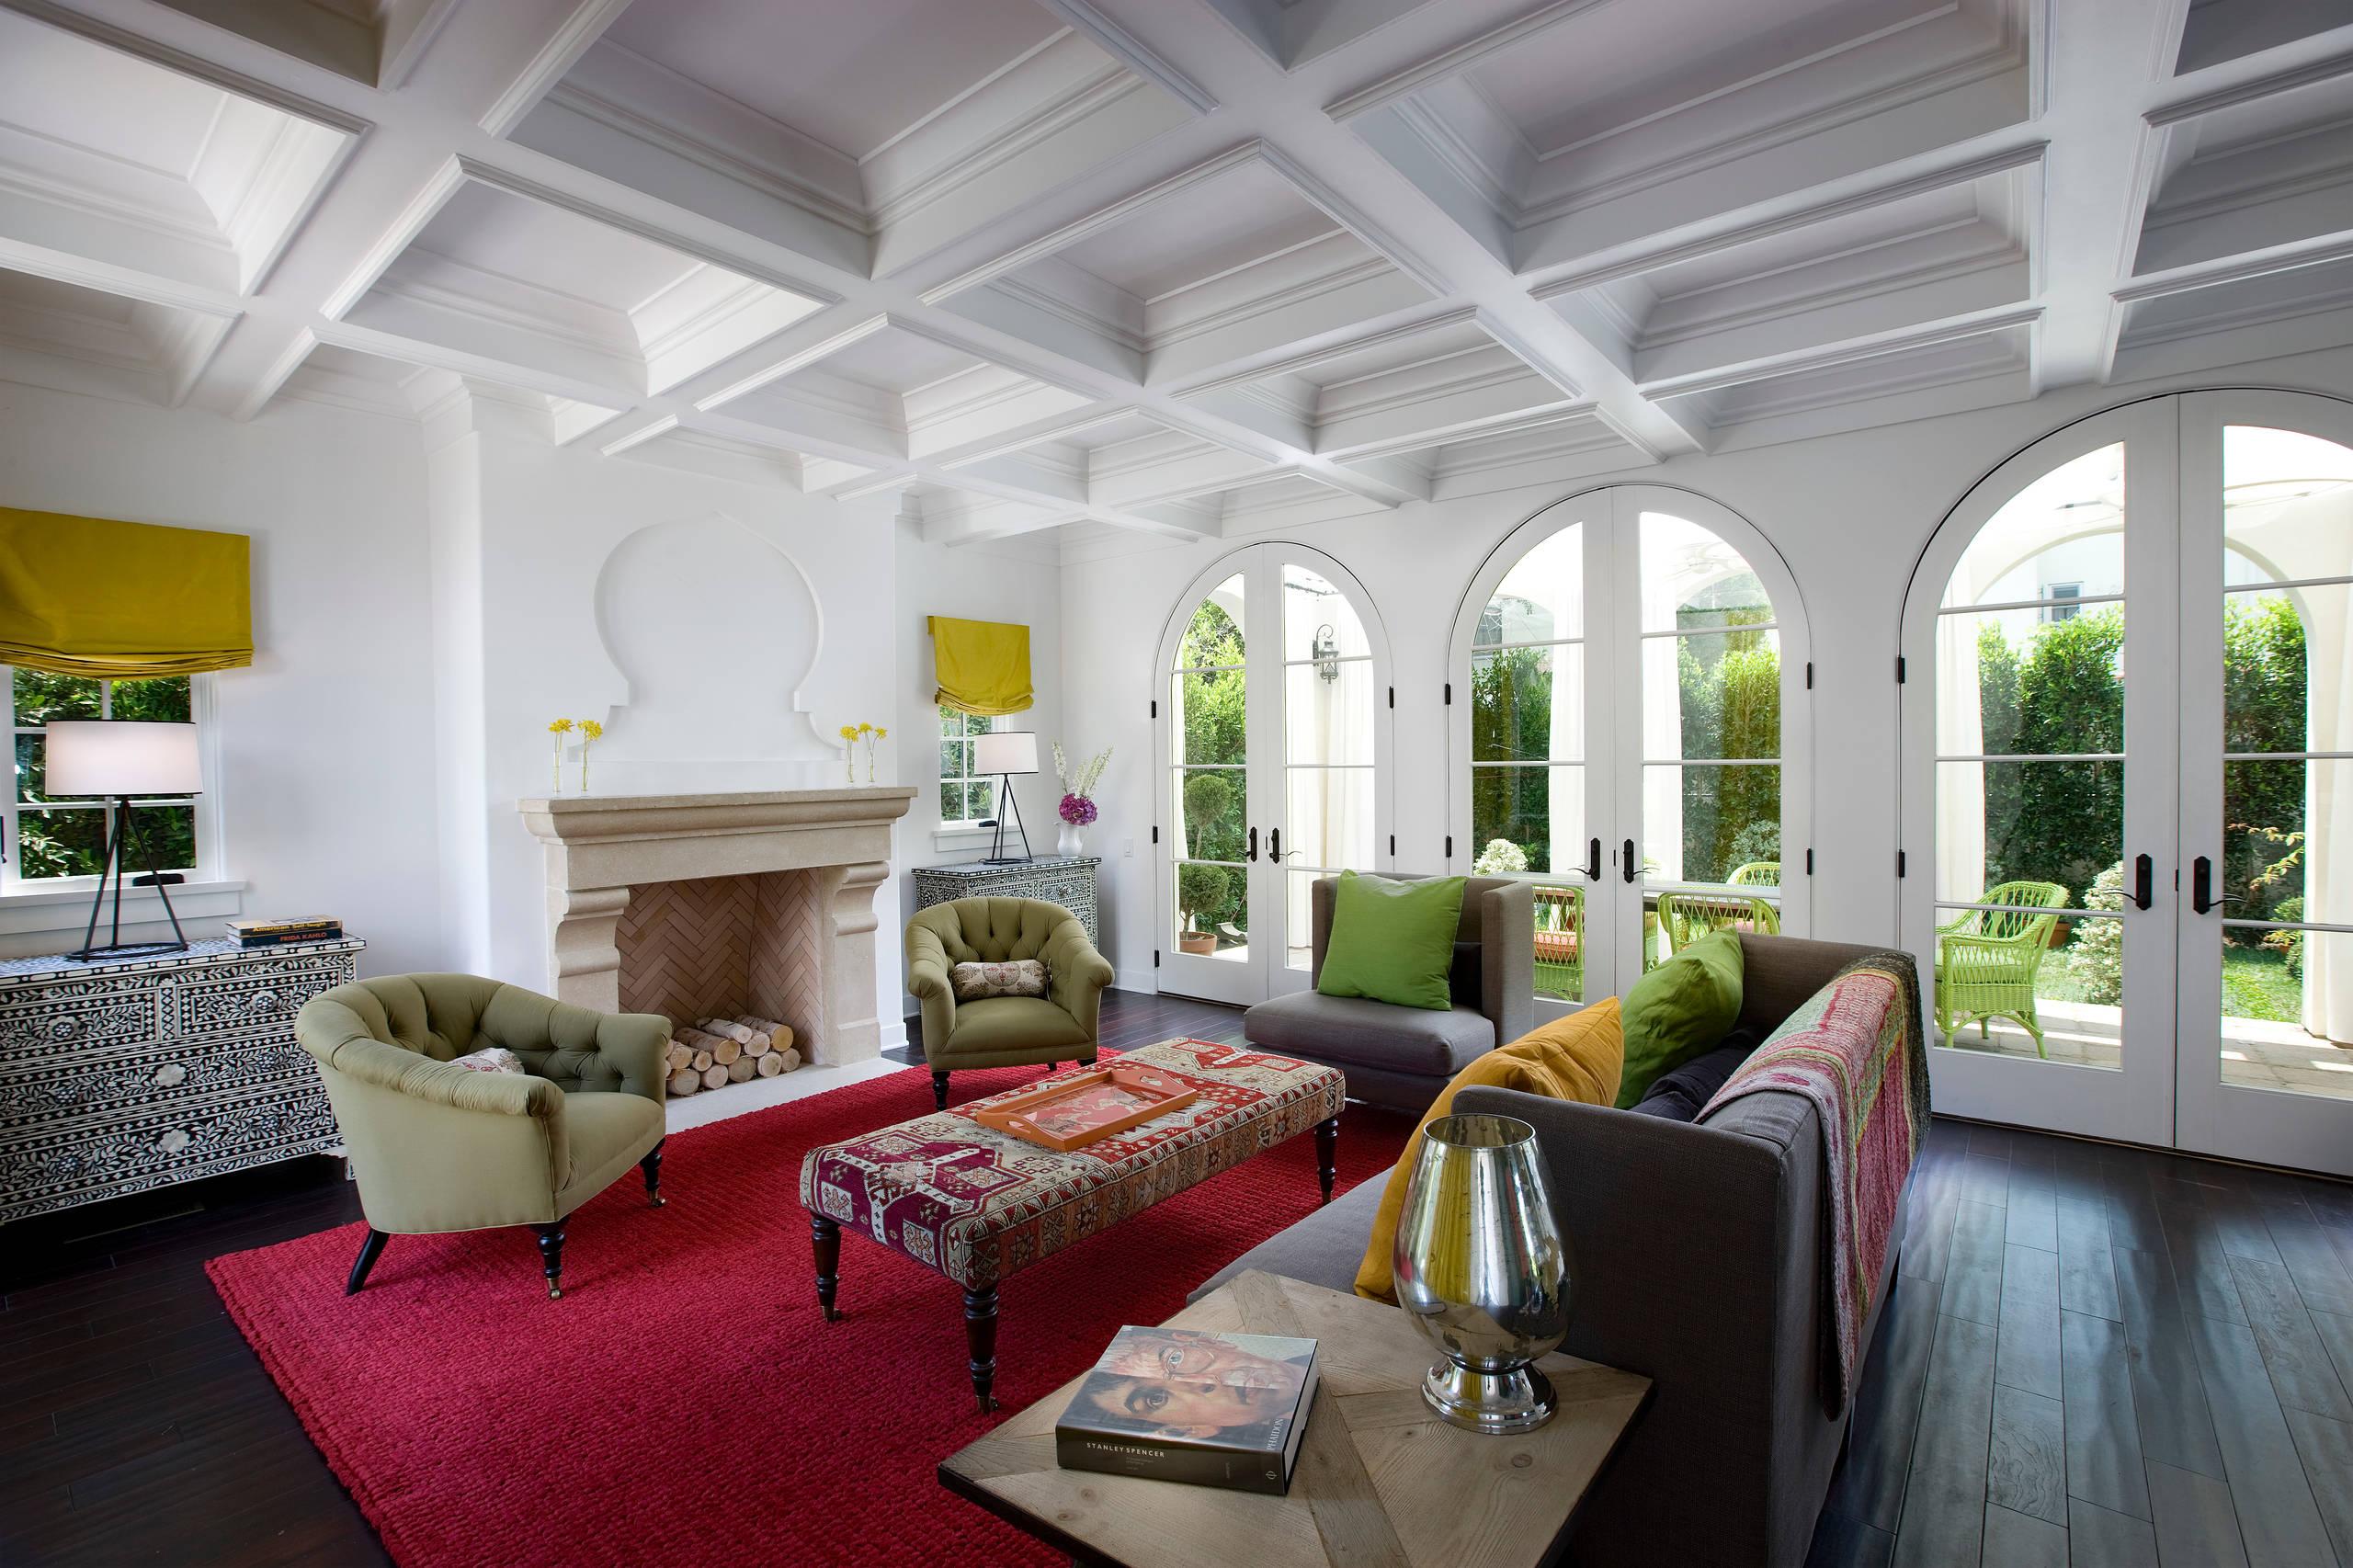 15 Beautiful Mediterranean Living Room Designs You'll Love on Photo Room Decor  id=72872